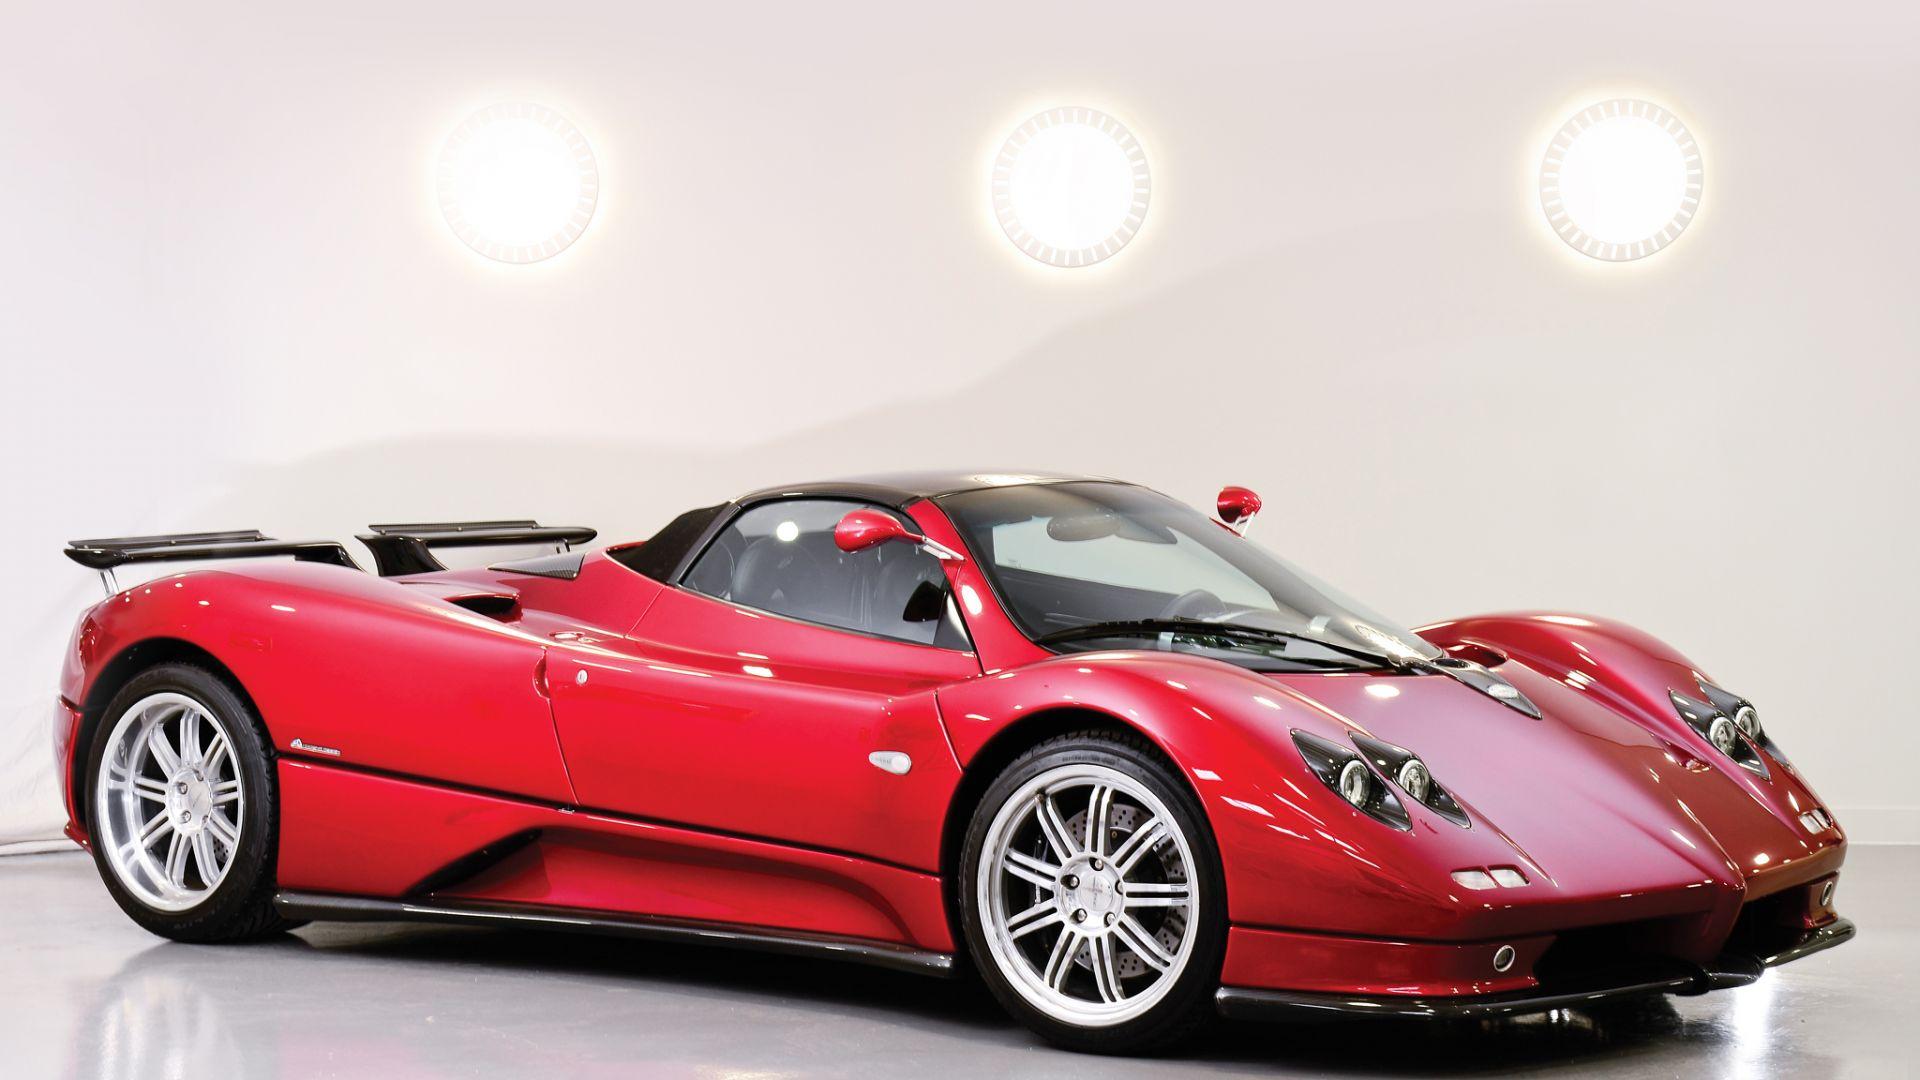 Wallpaper Pagani Zonda C12, roadster, red sports car